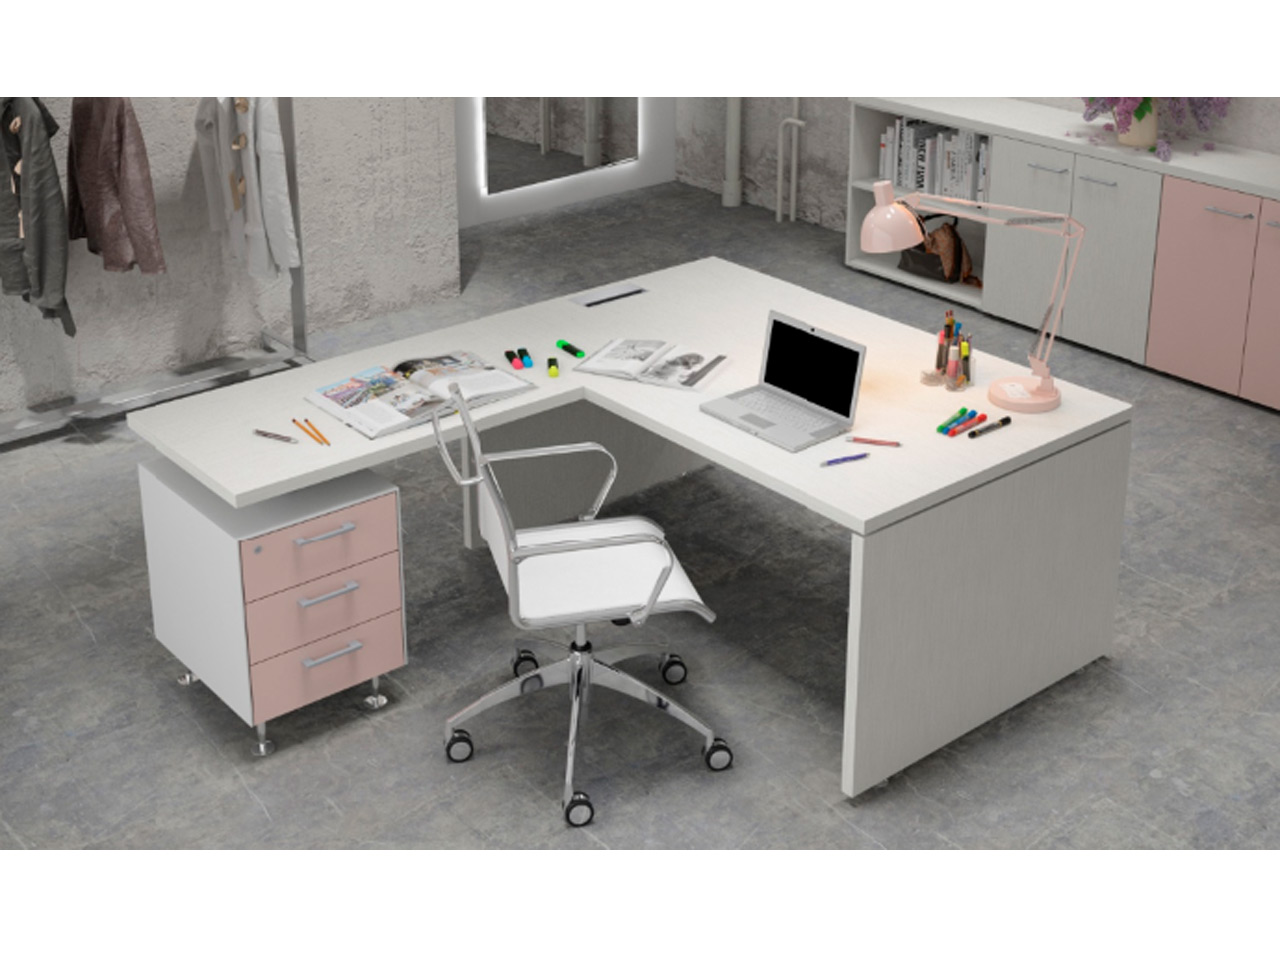 5 tendencias de arquitectura de oficinas modernas for Despachos modernos